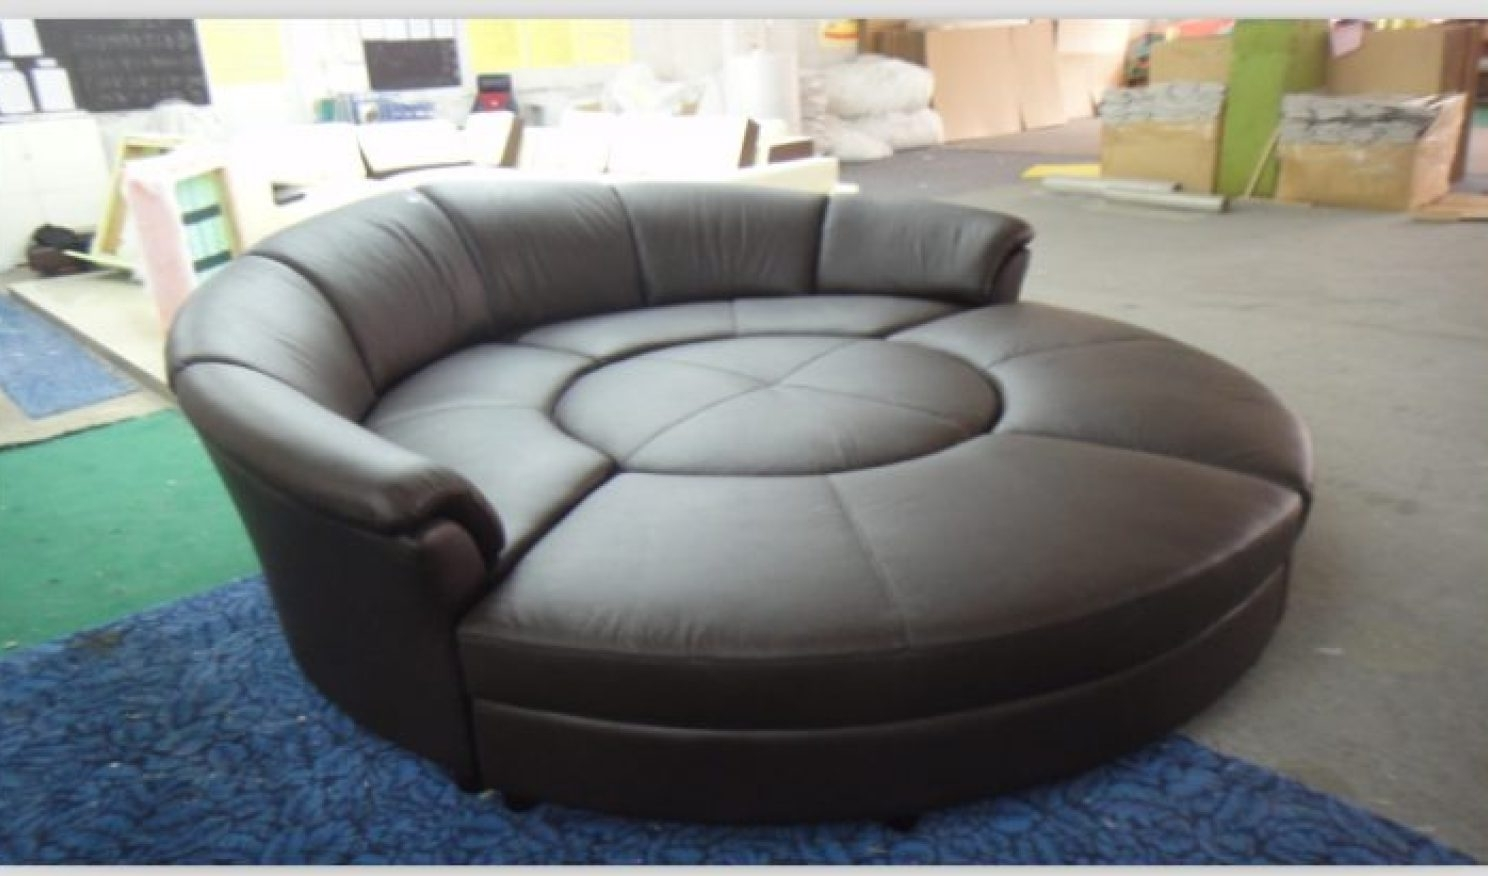 Circular Sofa Chairs For 2018 Sofa : Sofa Cute Big Chairs Stunning Circular Chair Explore Round (View 8 of 20)